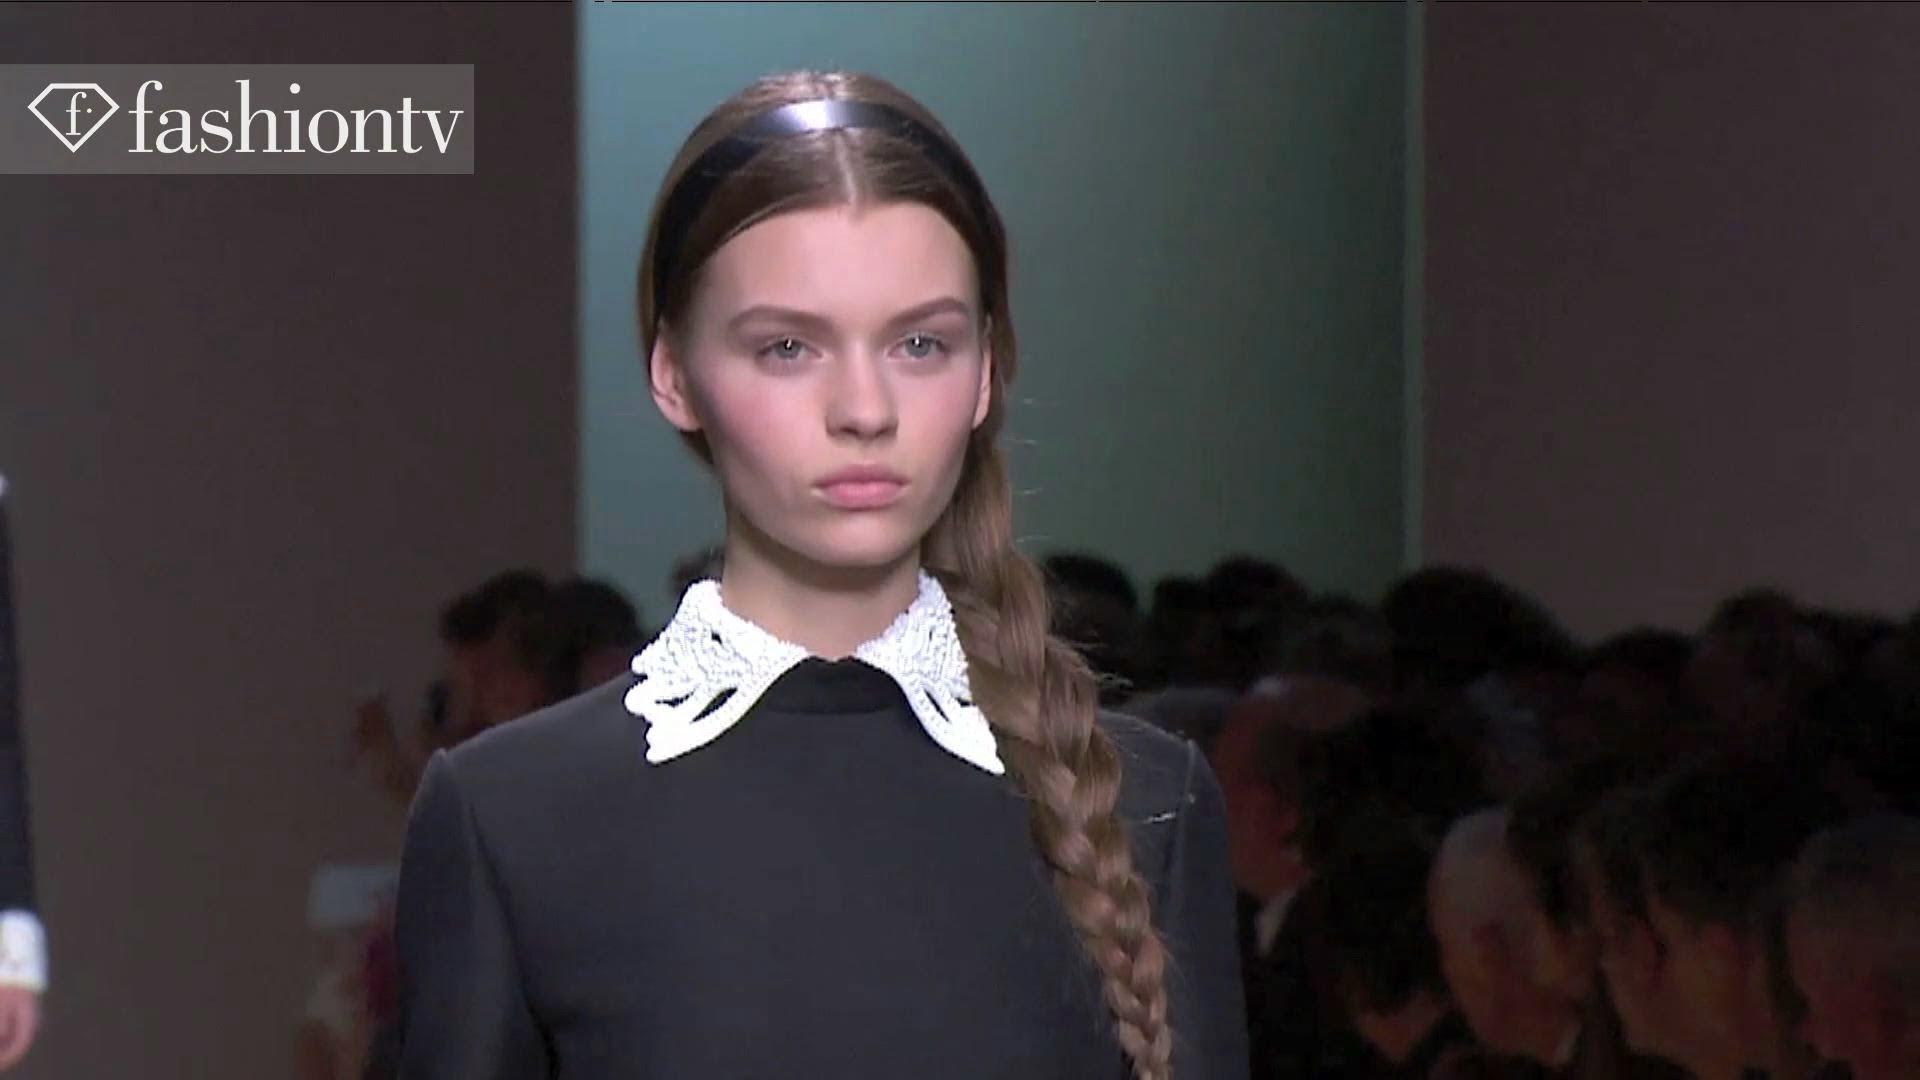 valentino-fallwinter-2013-14-runway-show-paris-fashion-week-pfw